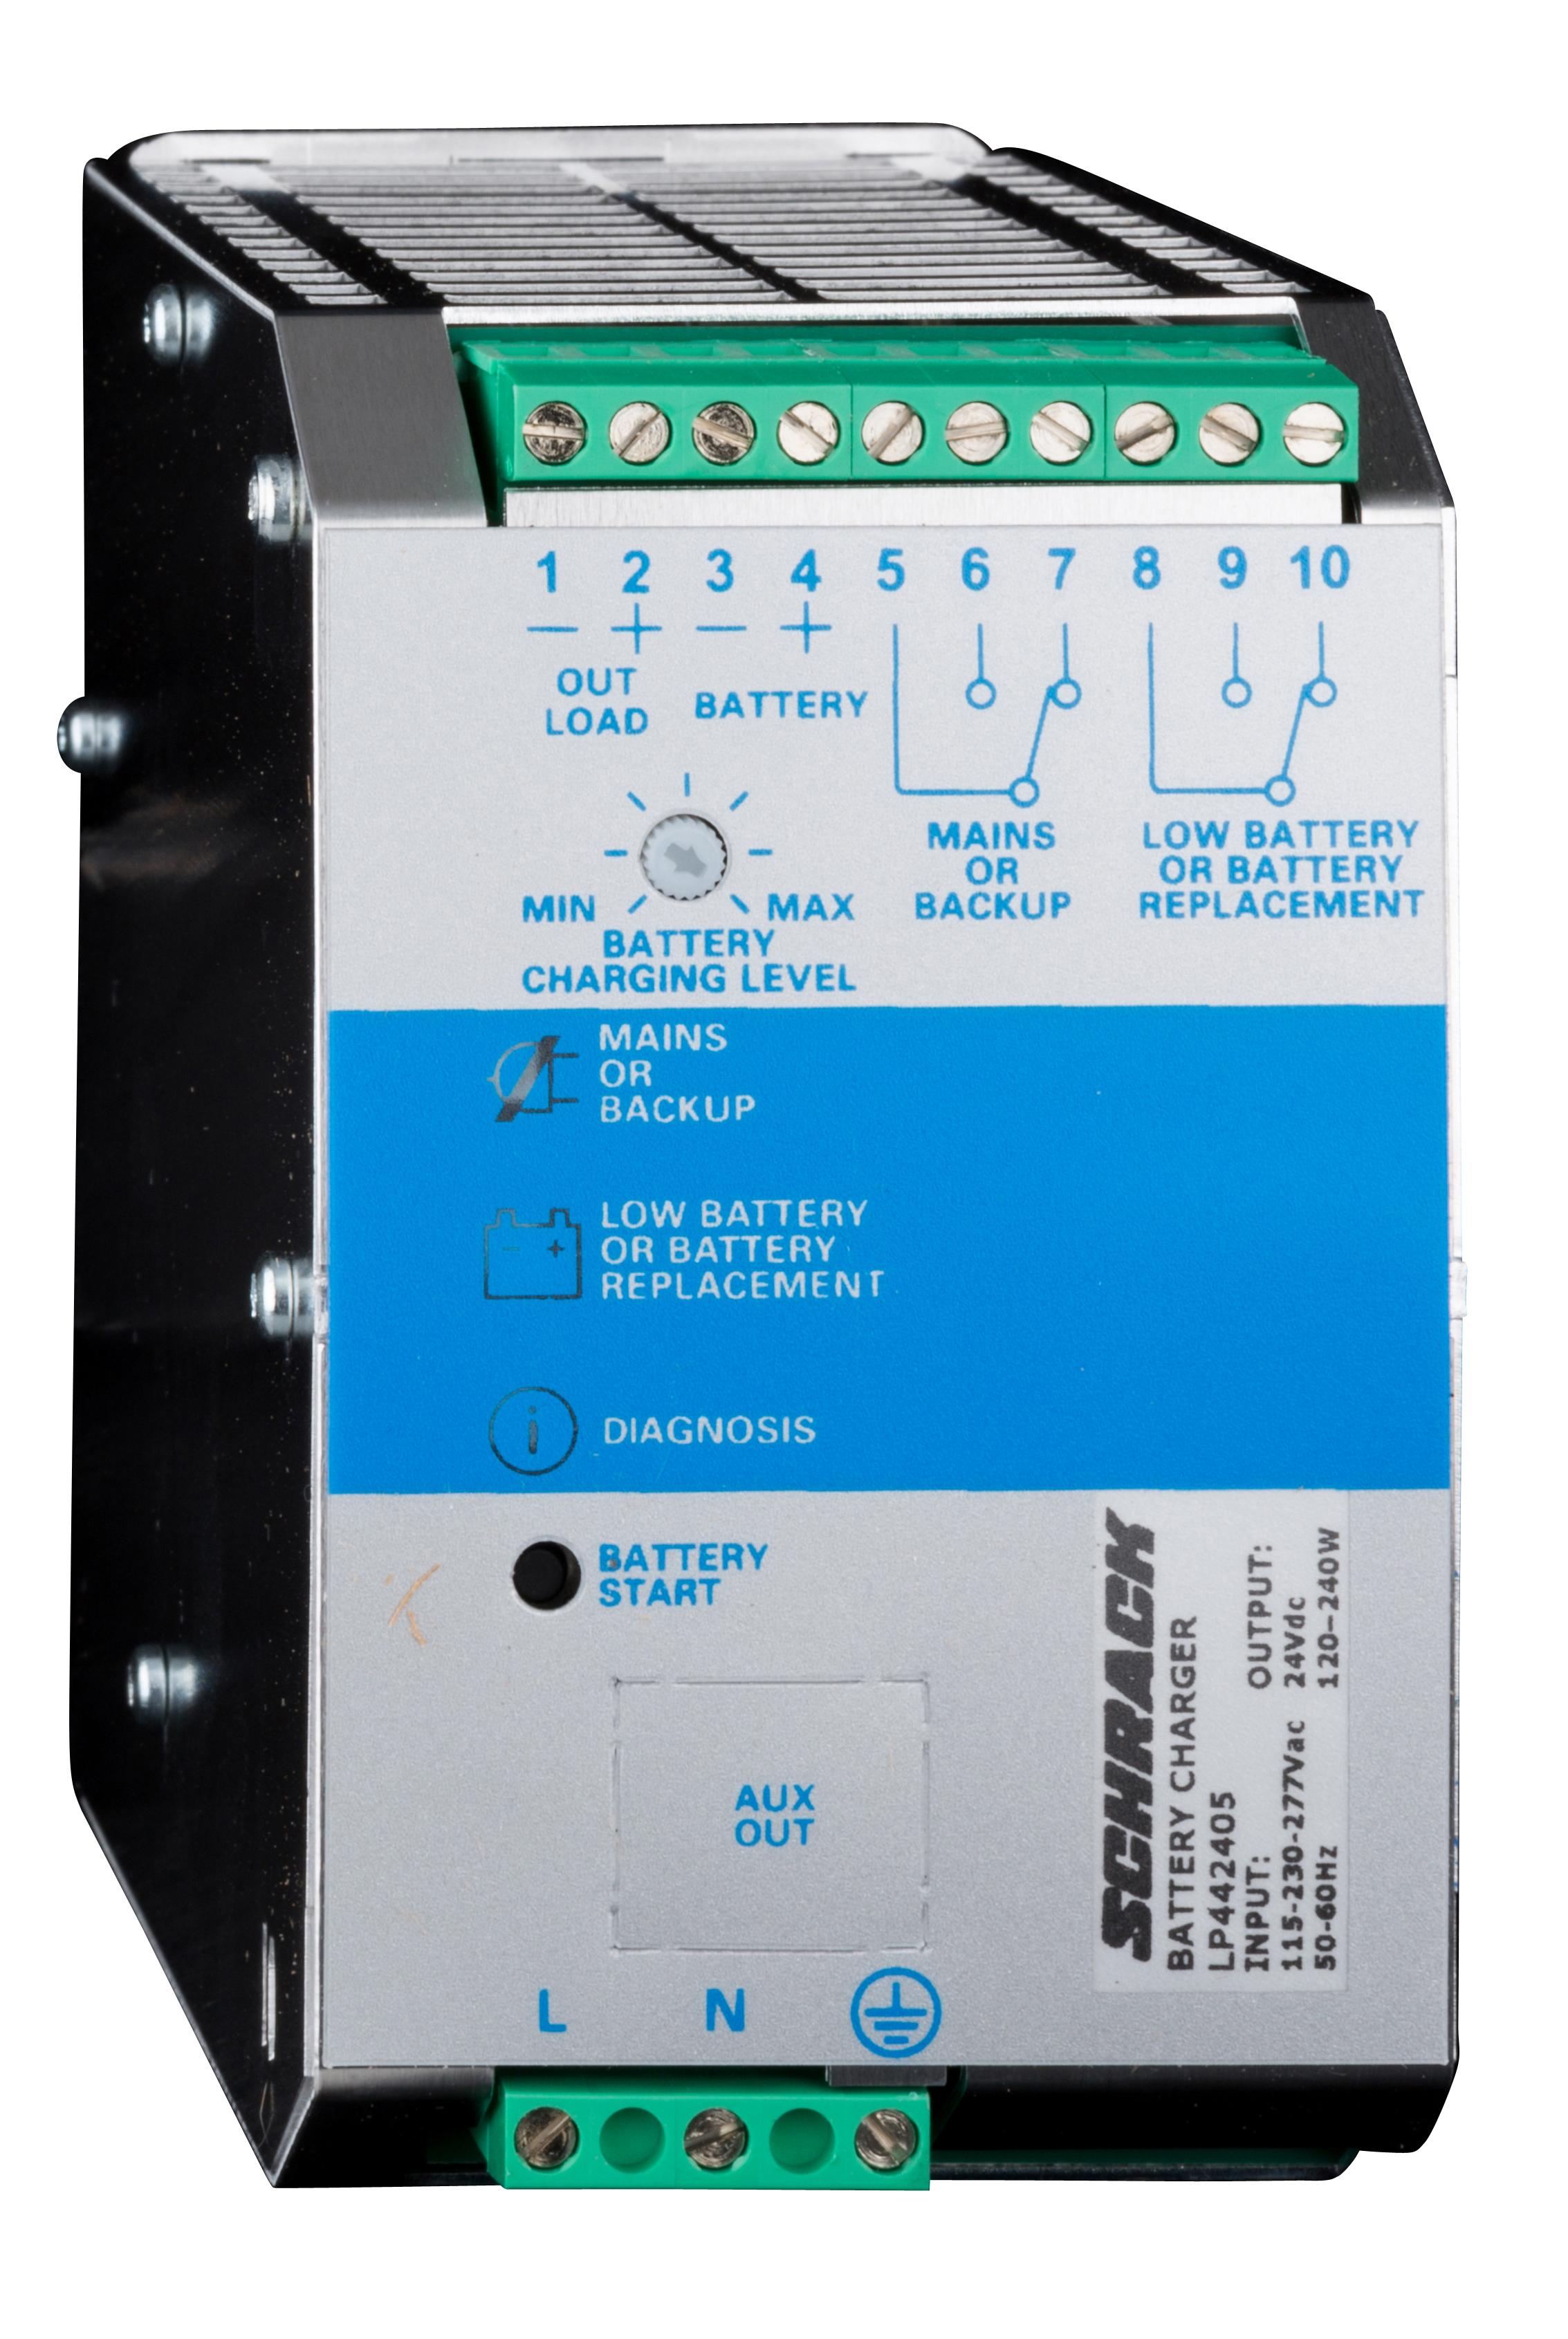 1 Stk Einphasiges Netzgerät getaktet mit USV, 230VAC/24VDC, 5A LP442405--